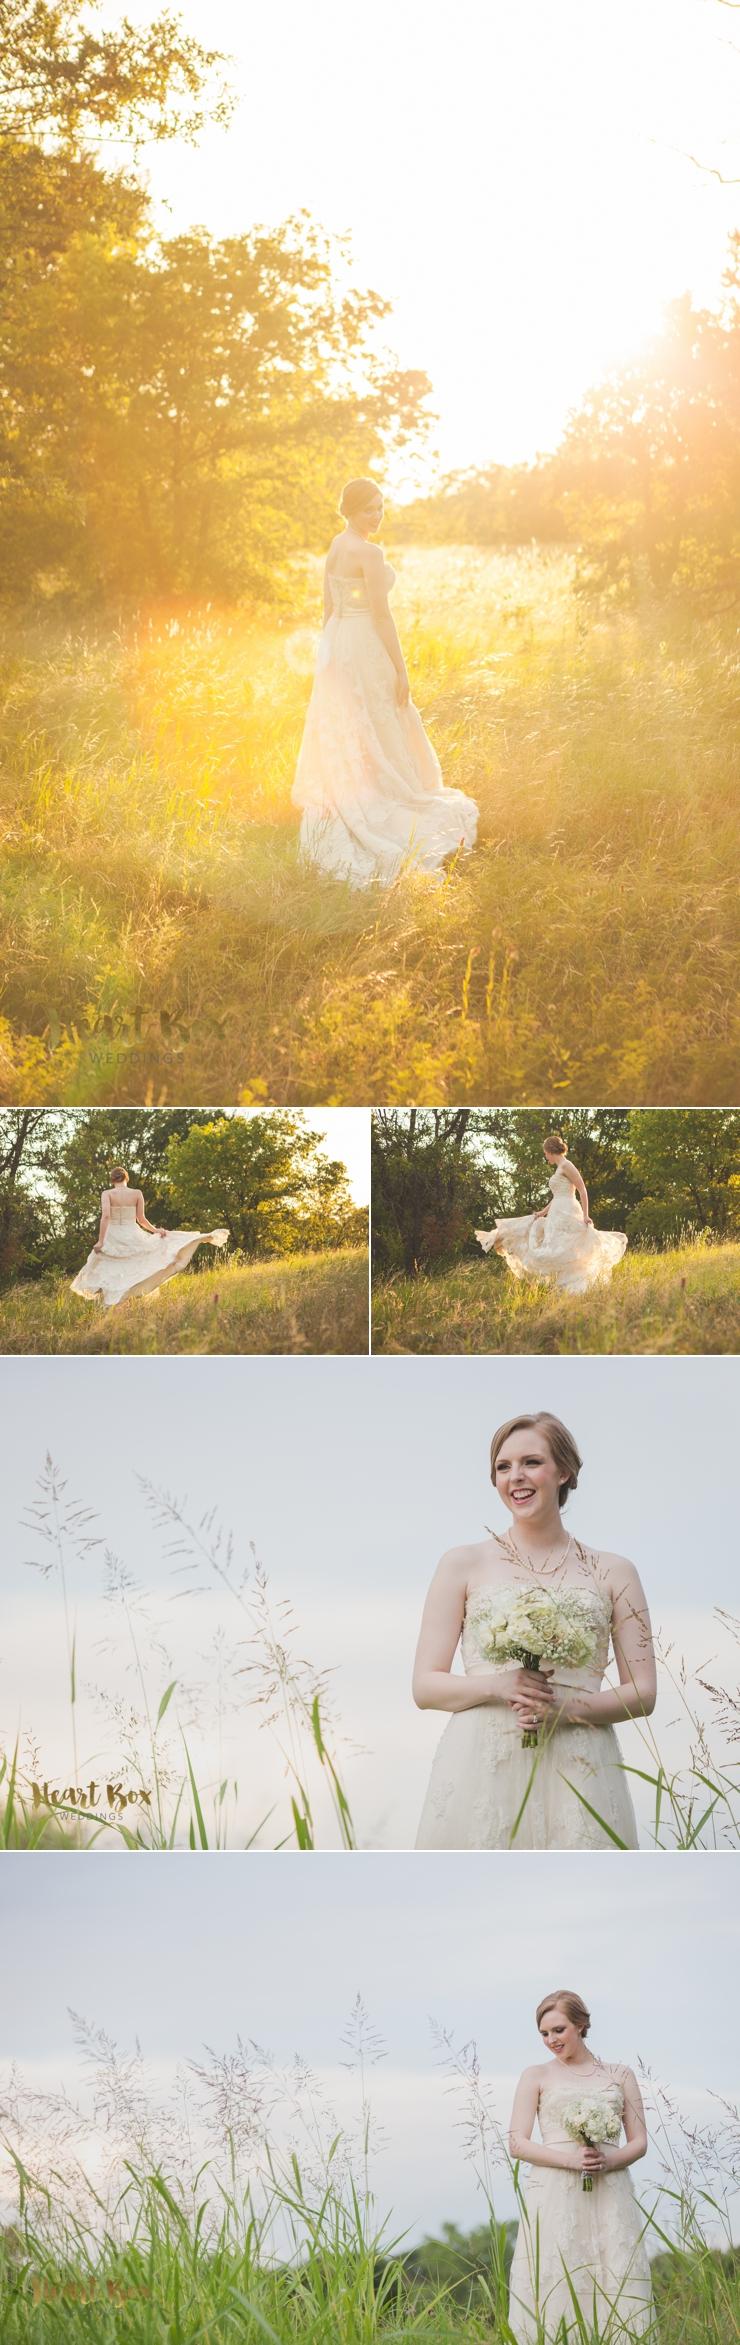 Kaylin Bridal Blog Collages 8.jpg